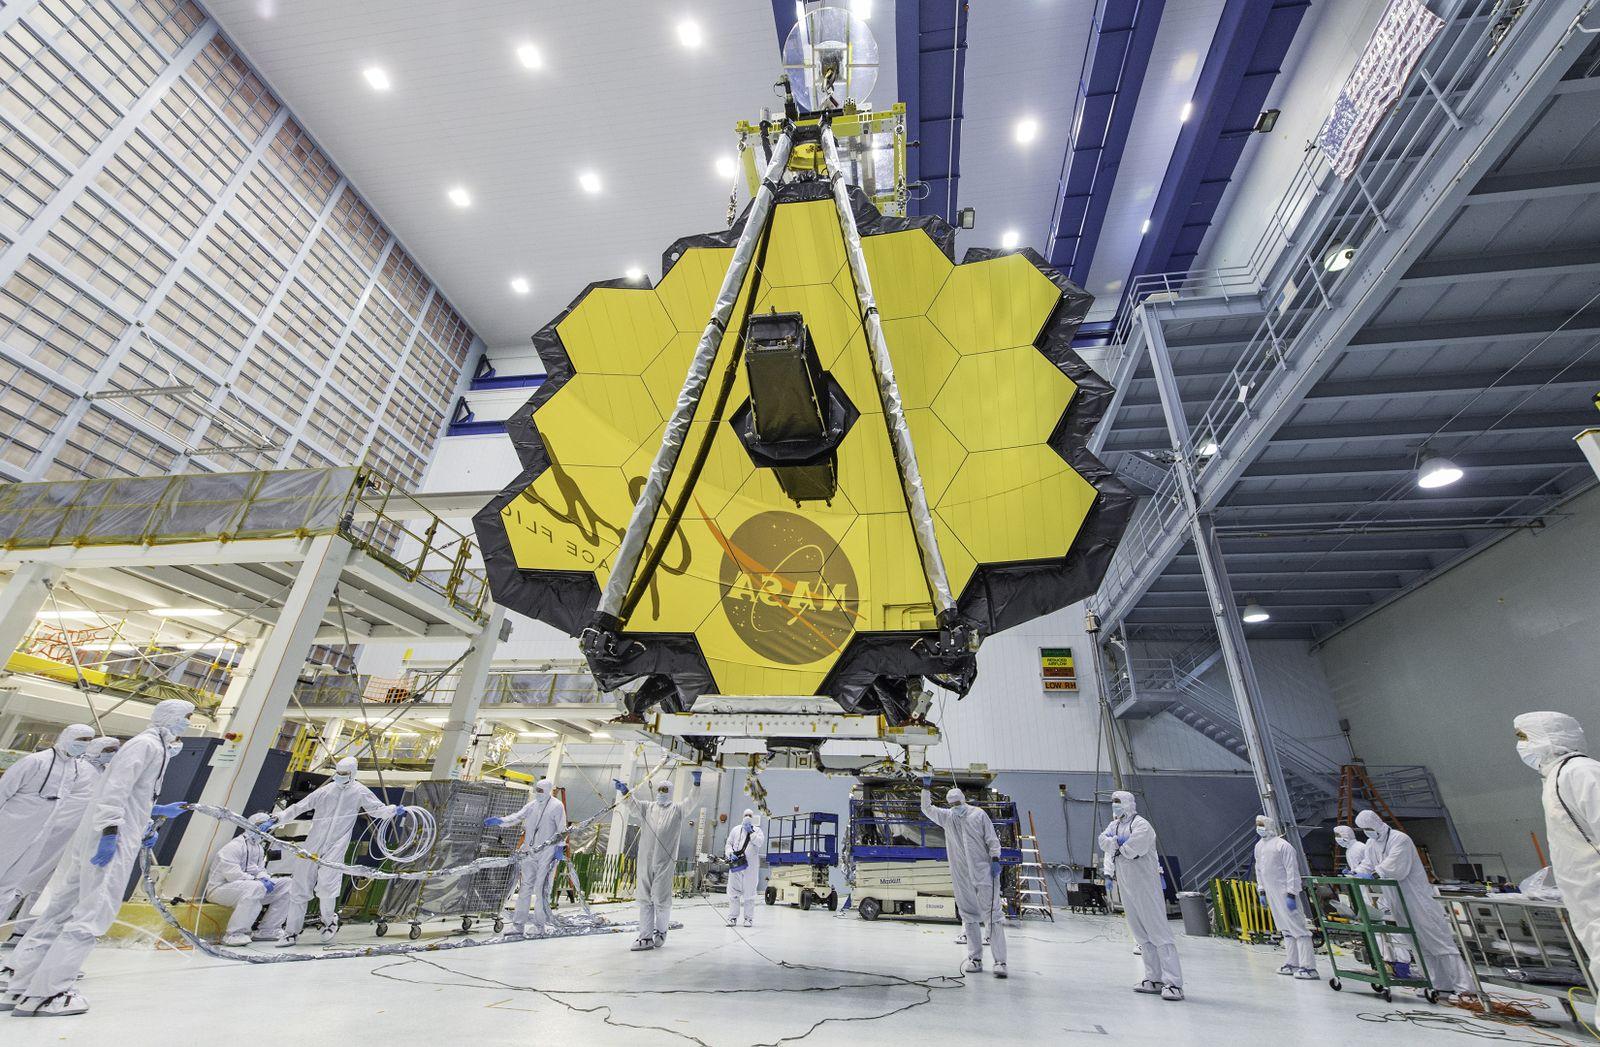 NASA's James Webb Space Telescope Will Launch Into Orbit in December